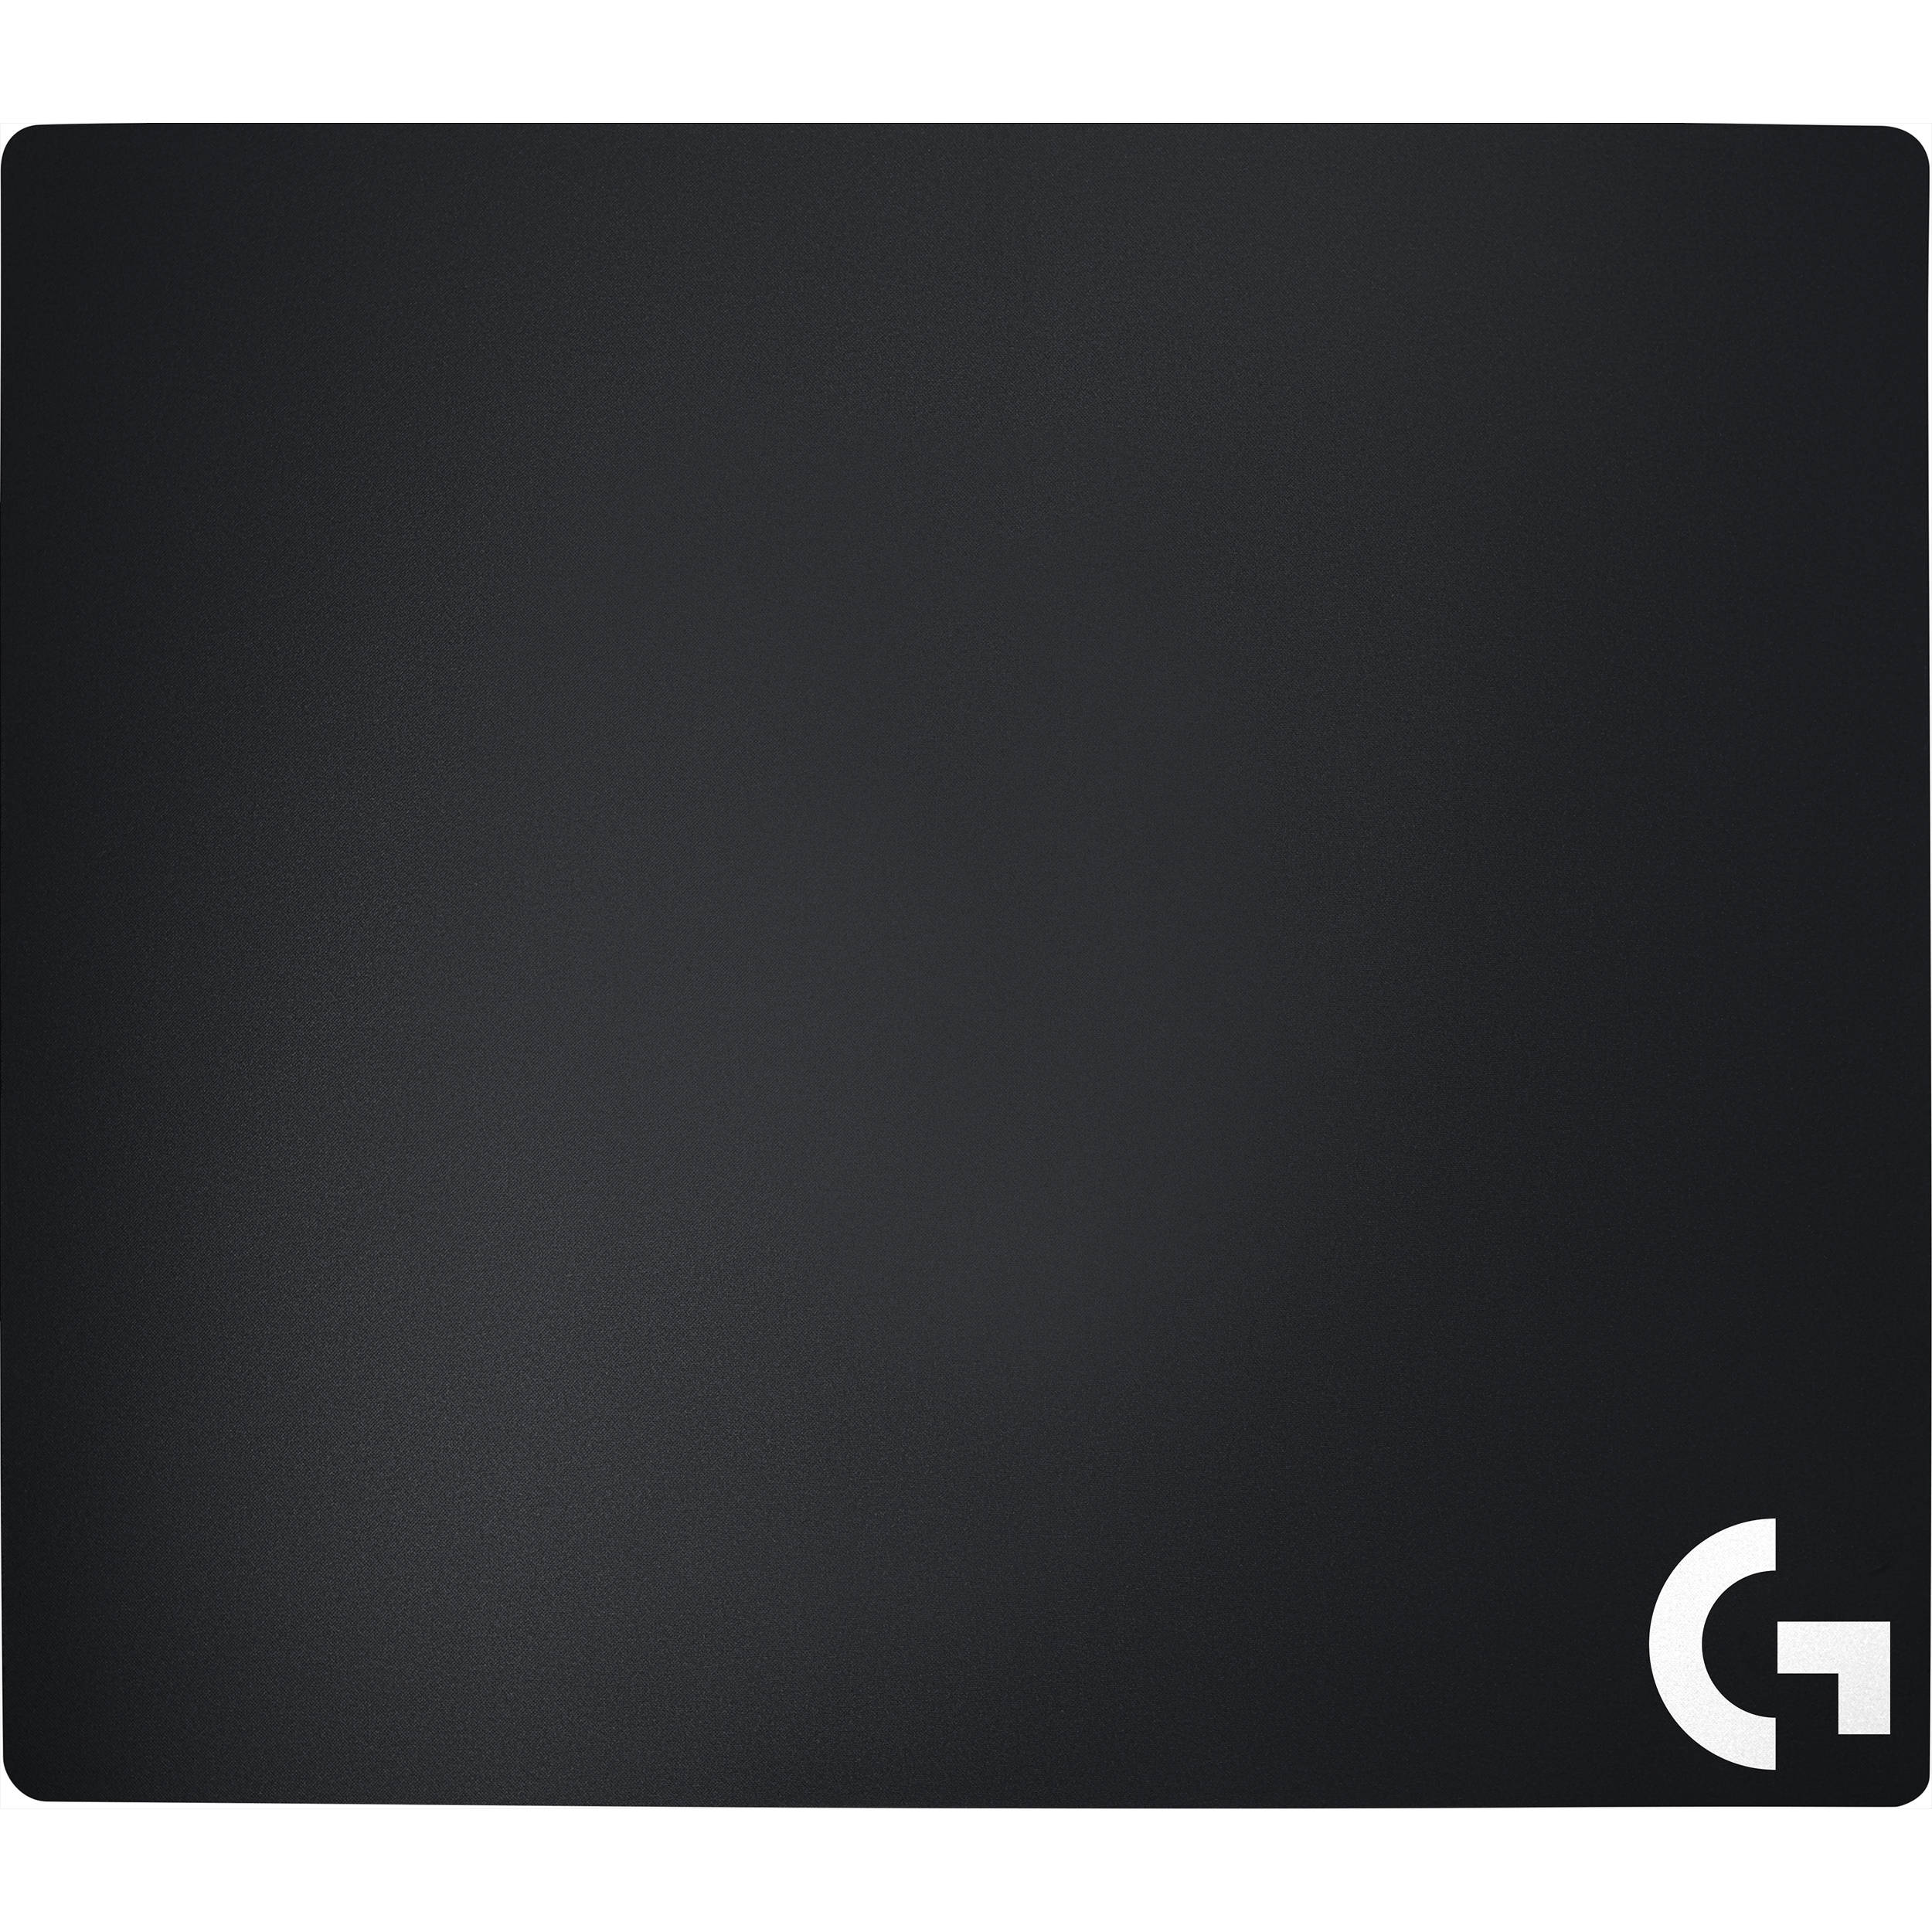 Logitech G G640 Large Cloth Gaming Mouse Pad 943-000088 B&H